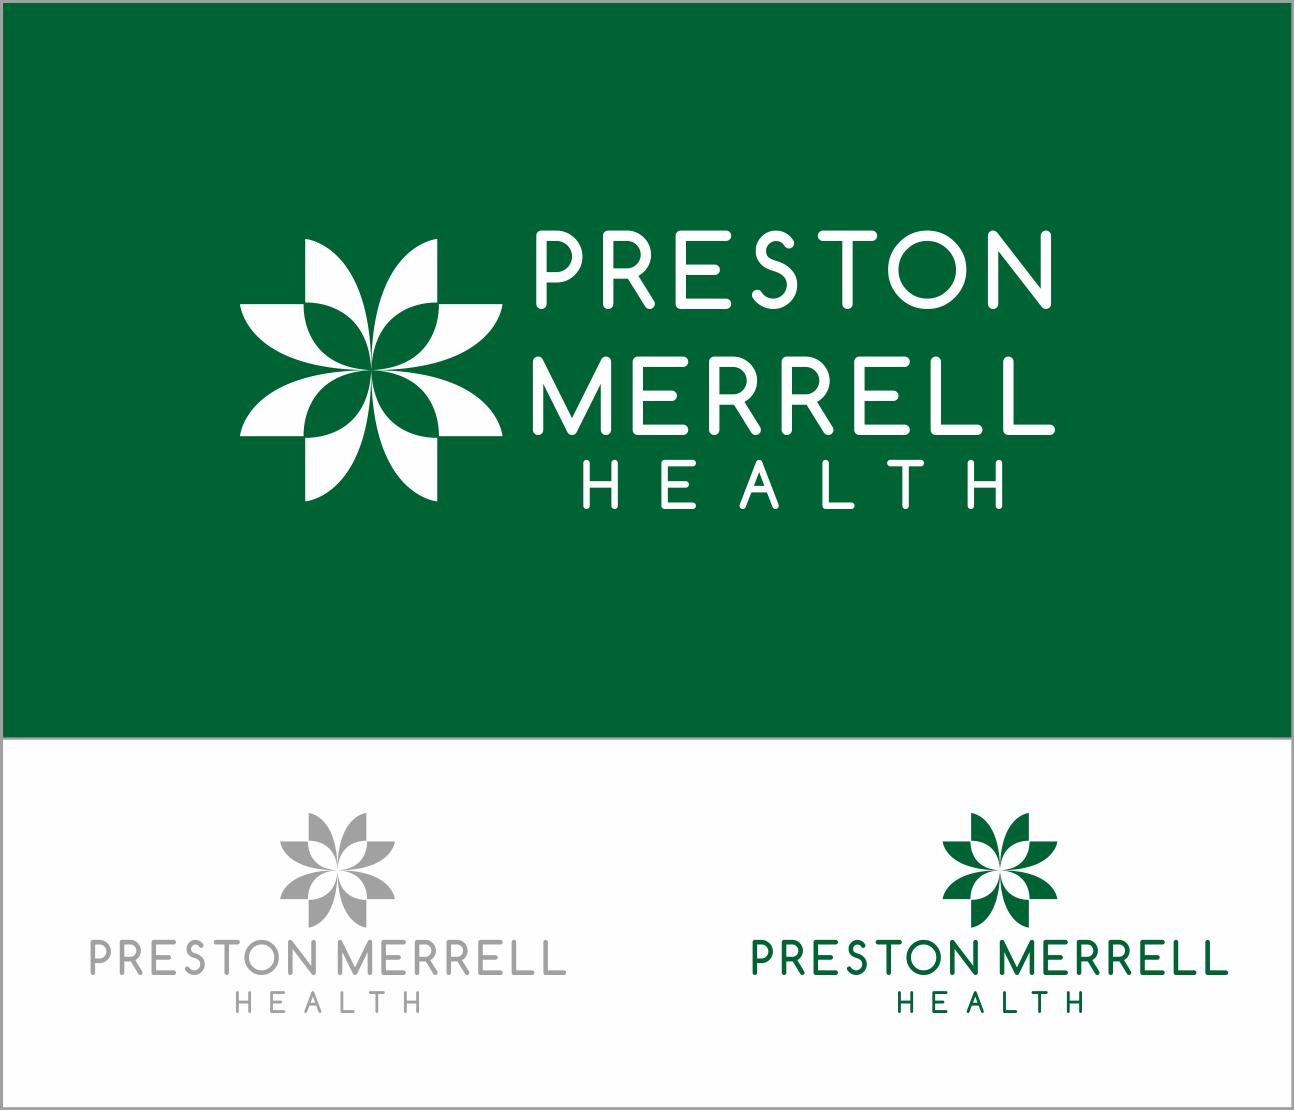 Logo Design by Armada Jamaluddin - Entry No. 274 in the Logo Design Contest Creative Logo Design for Preston Merrell Health.